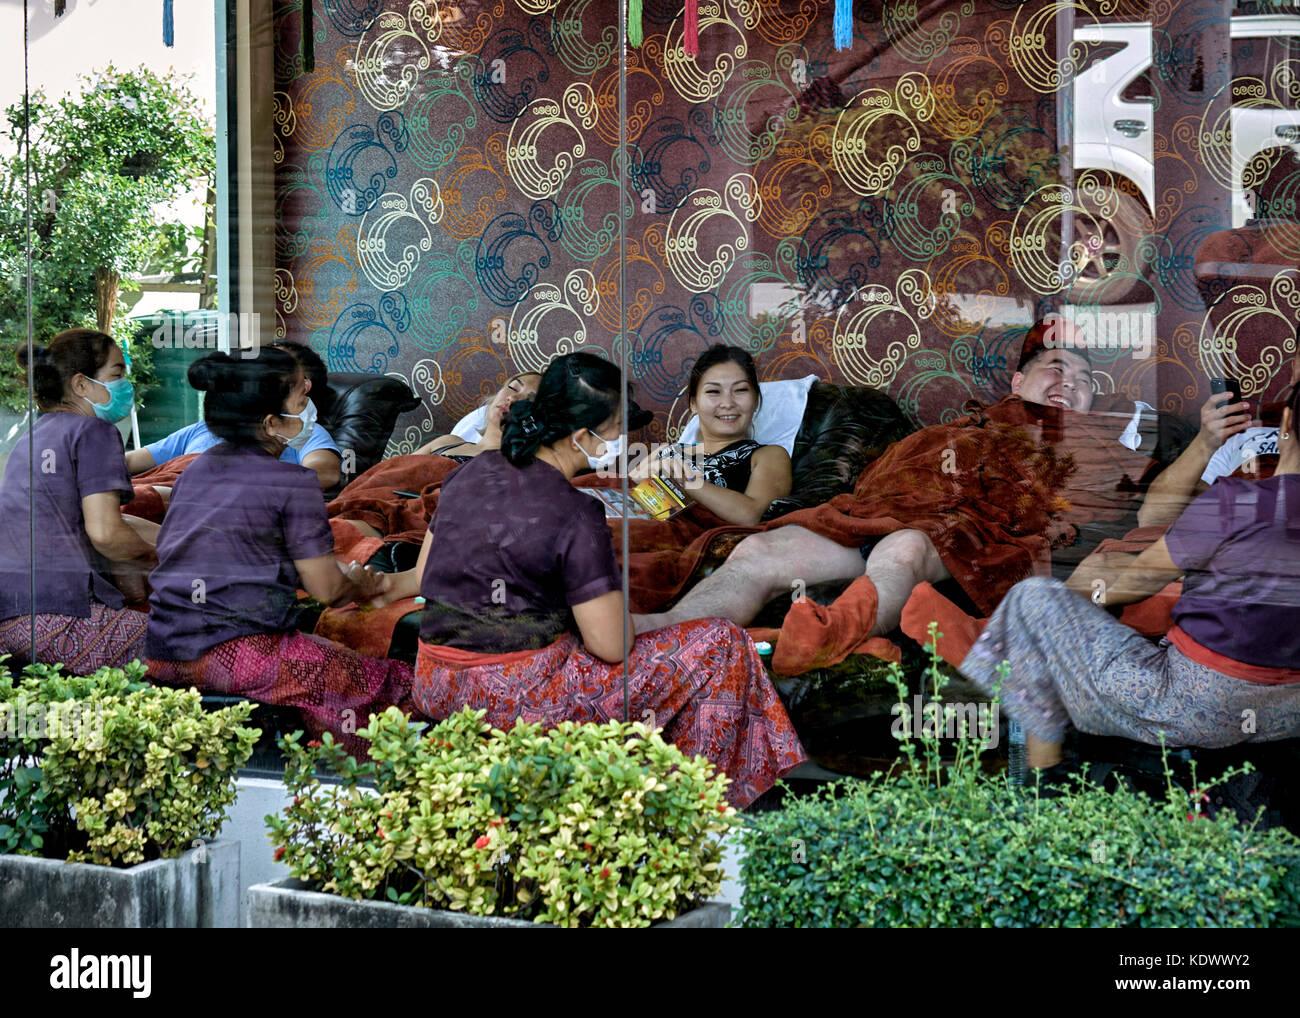 Thailand massage parlour. Foot massage parlor, masseuse. - Stock Image